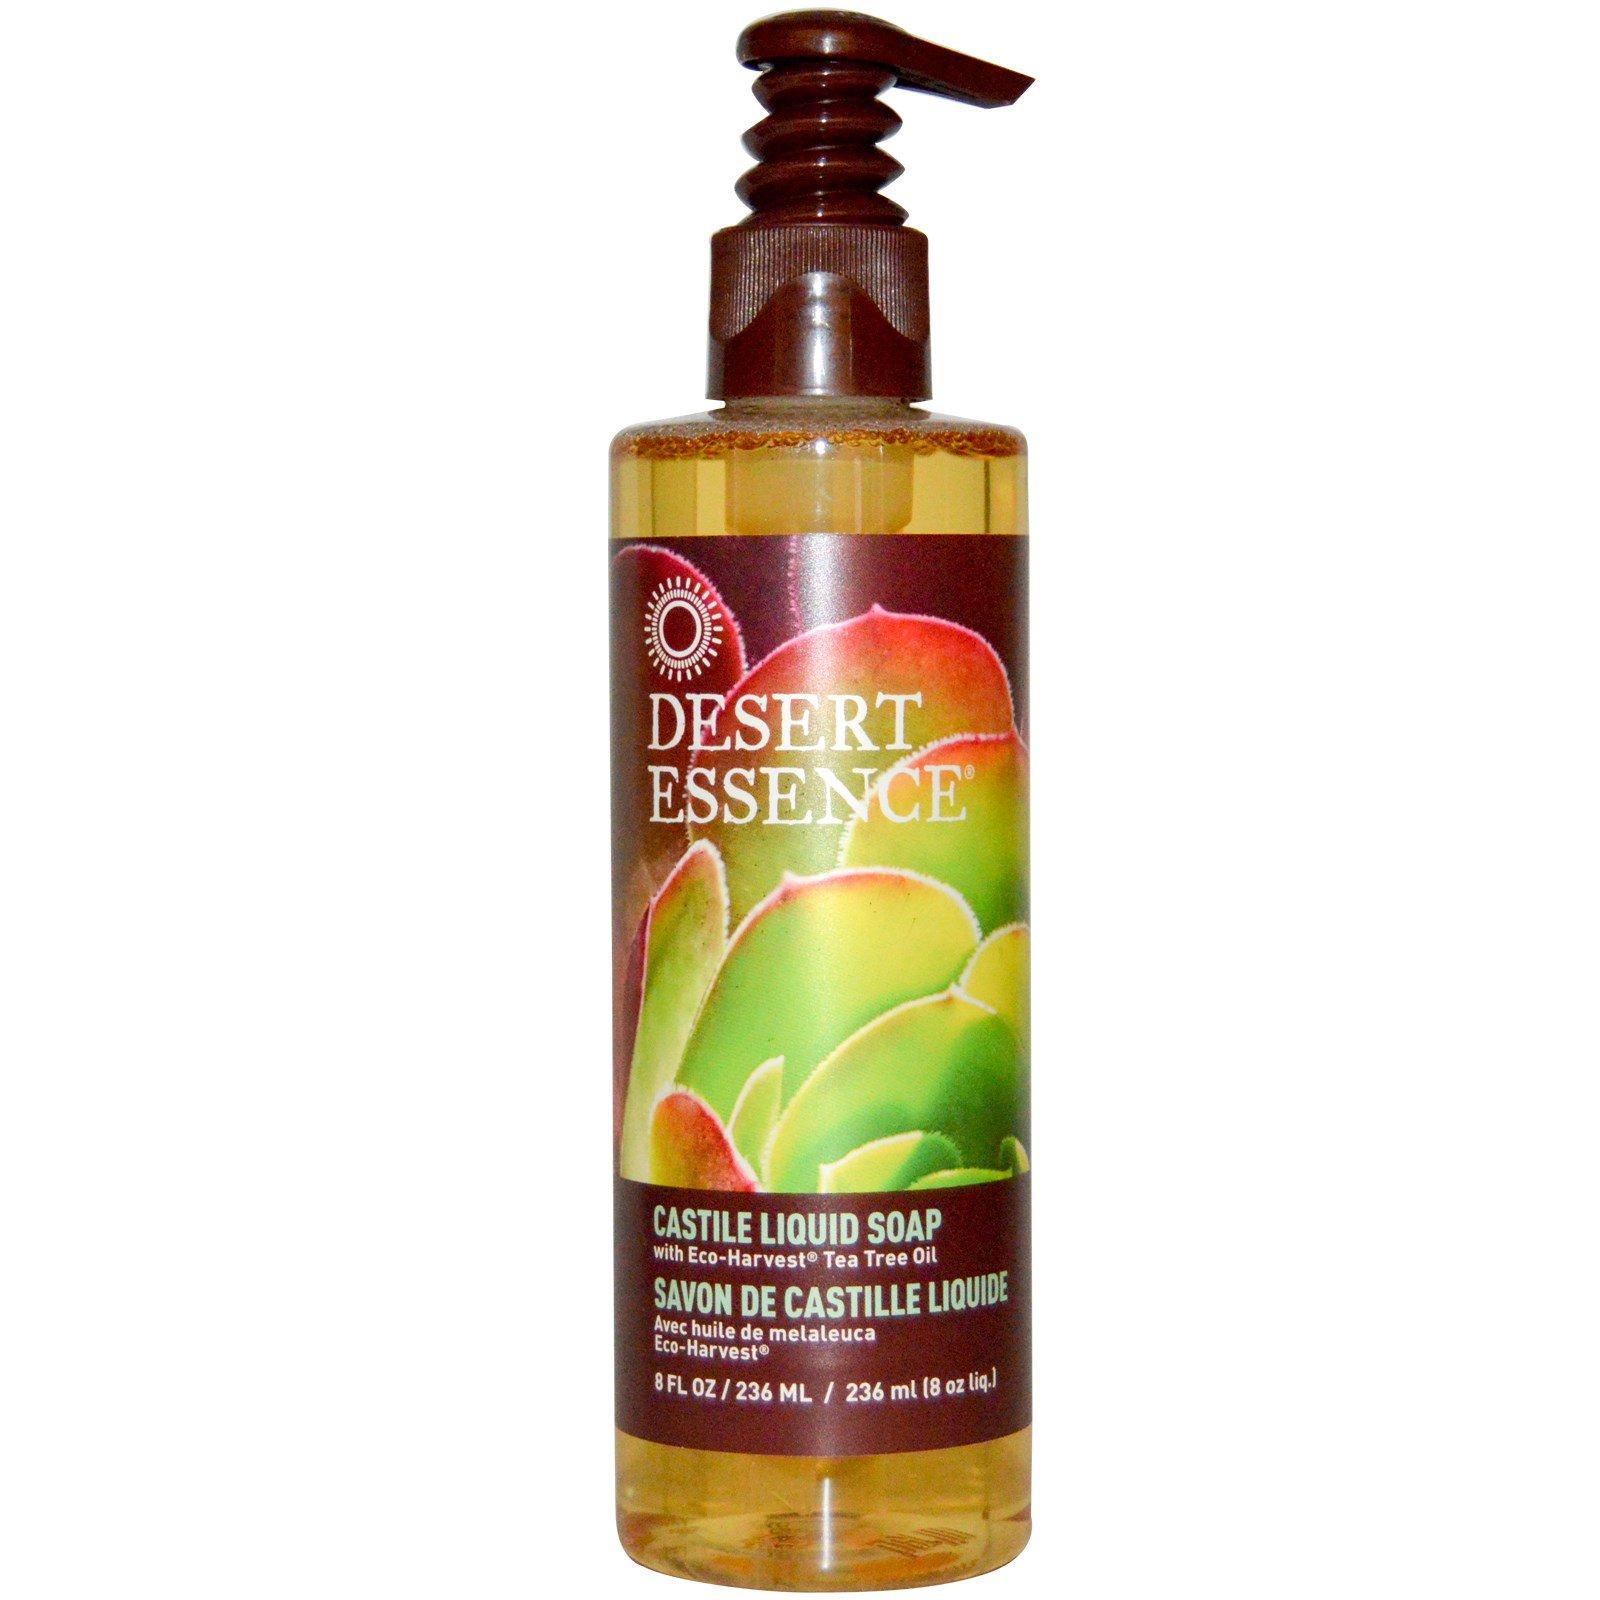 Desert Essence Castile Liquid Soap With Eco Harvest Tea